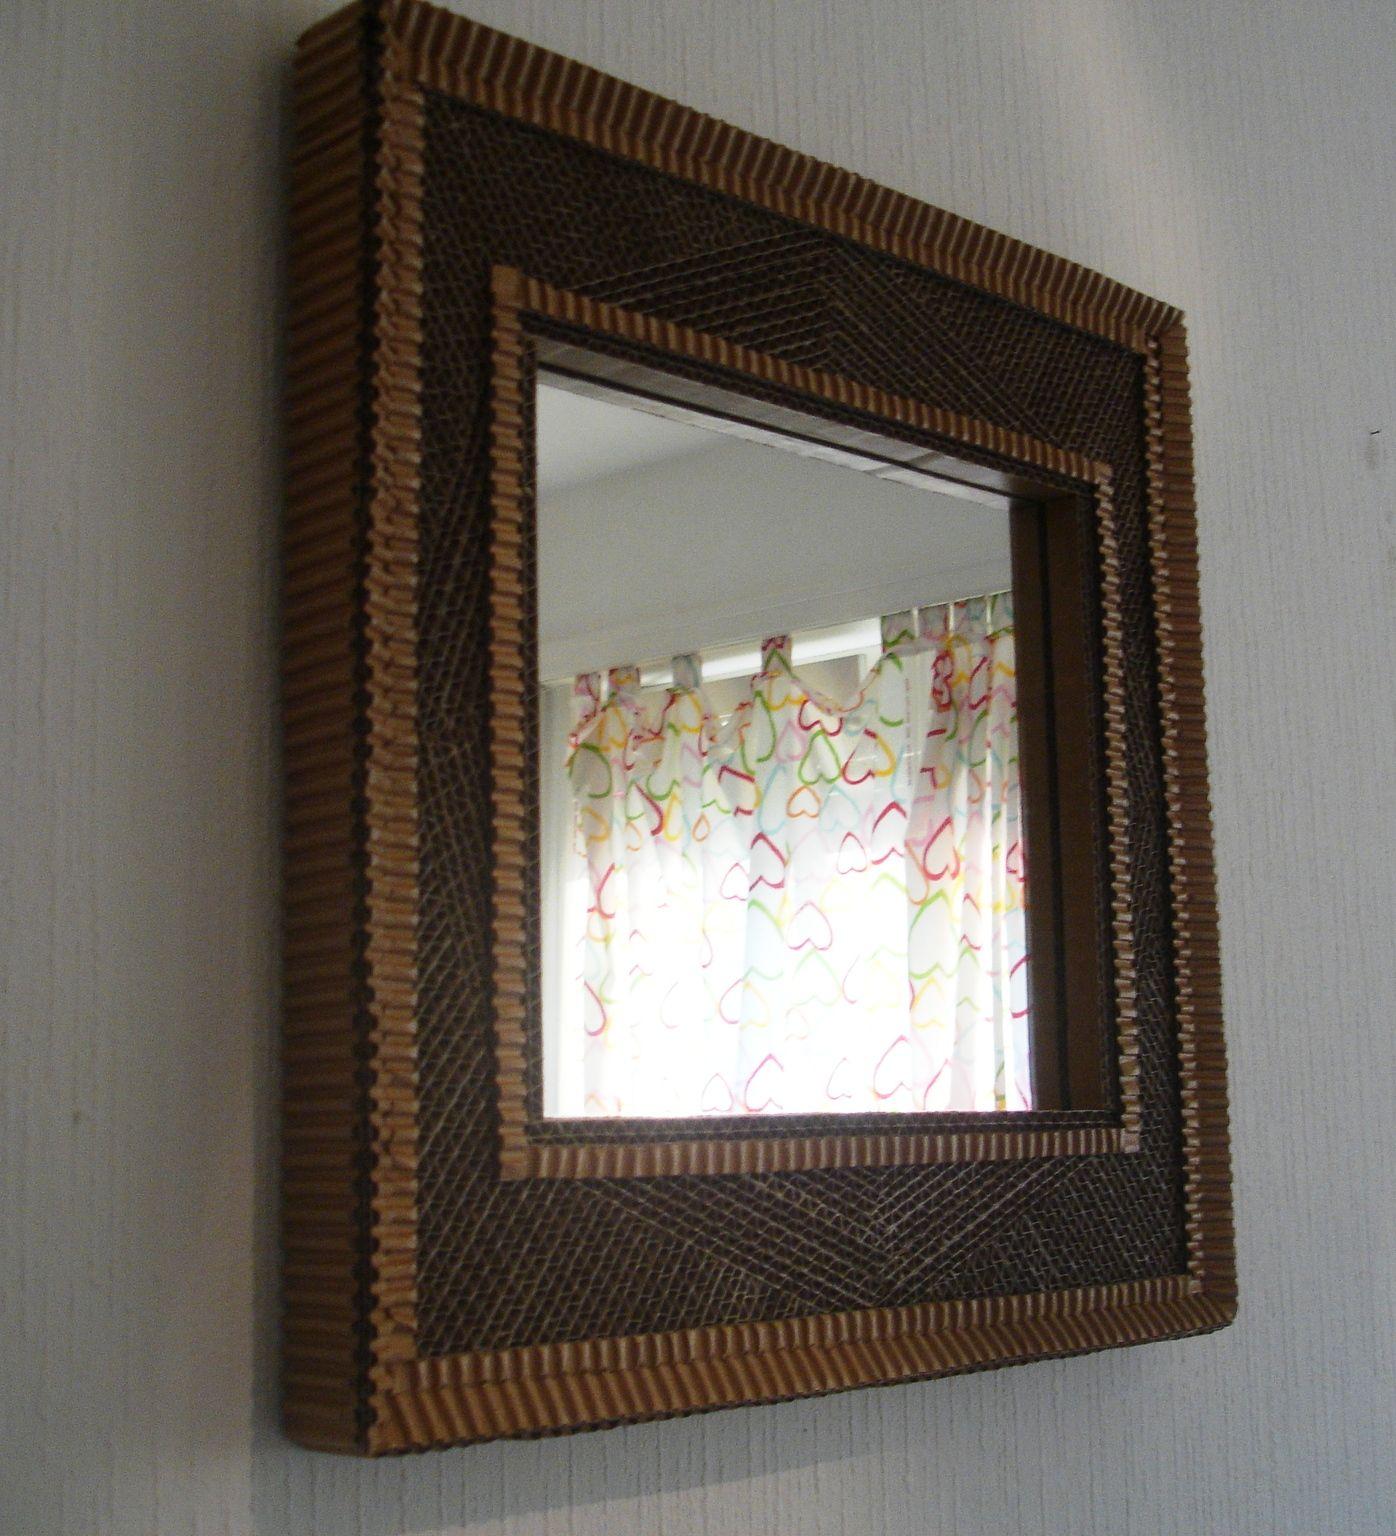 marco de carton | marcos para espejos en carton | Pinterest